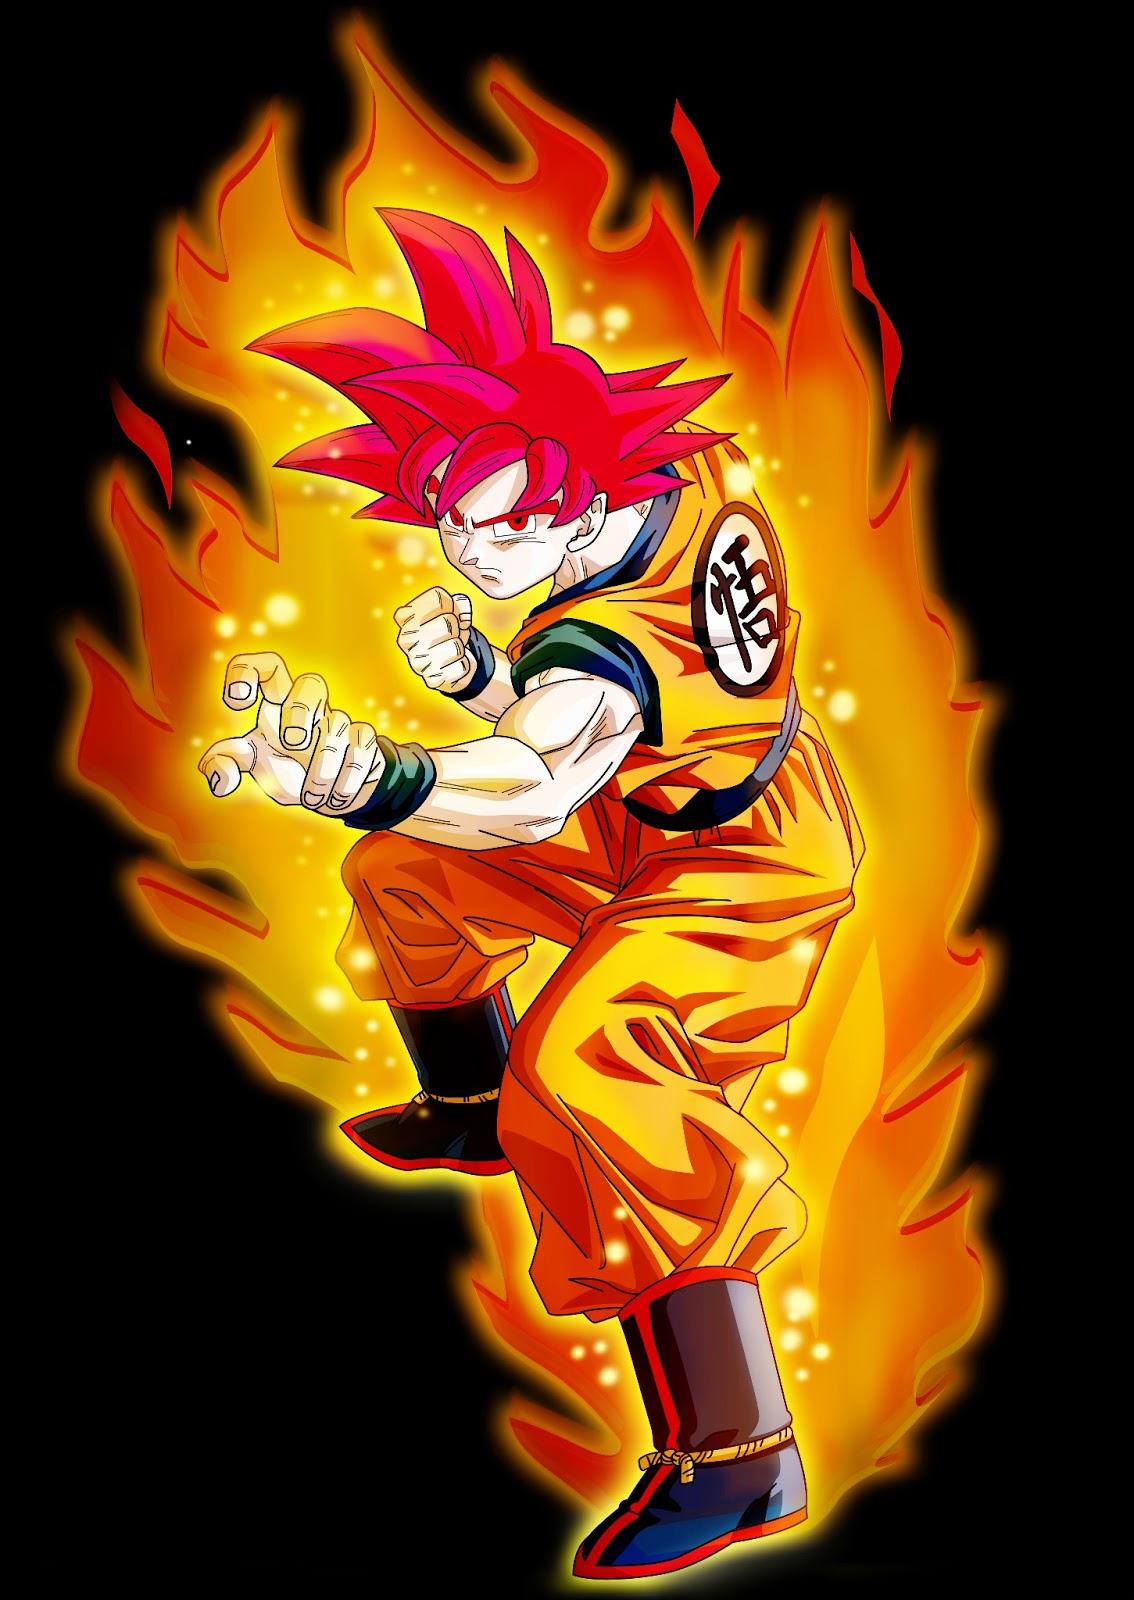 Excepcional Image - Goku-god-super-saiyn-deus-siayajin-dragon-ball-z-battle-og  DD45